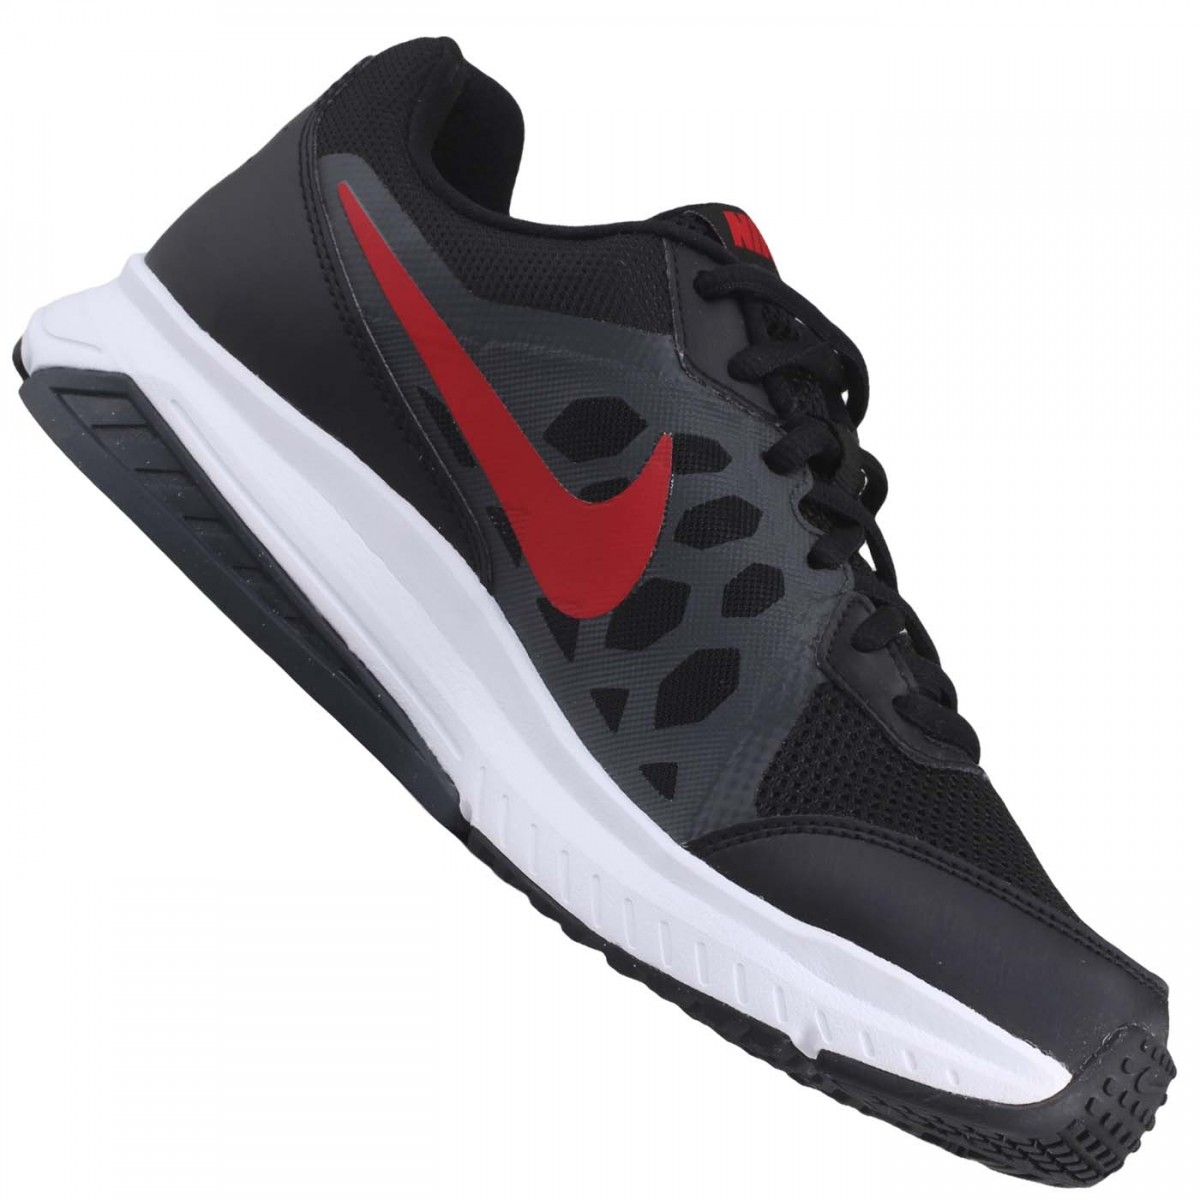 d85fddeabefd8 Tênis Nike Dart 11 MSL - Masculino